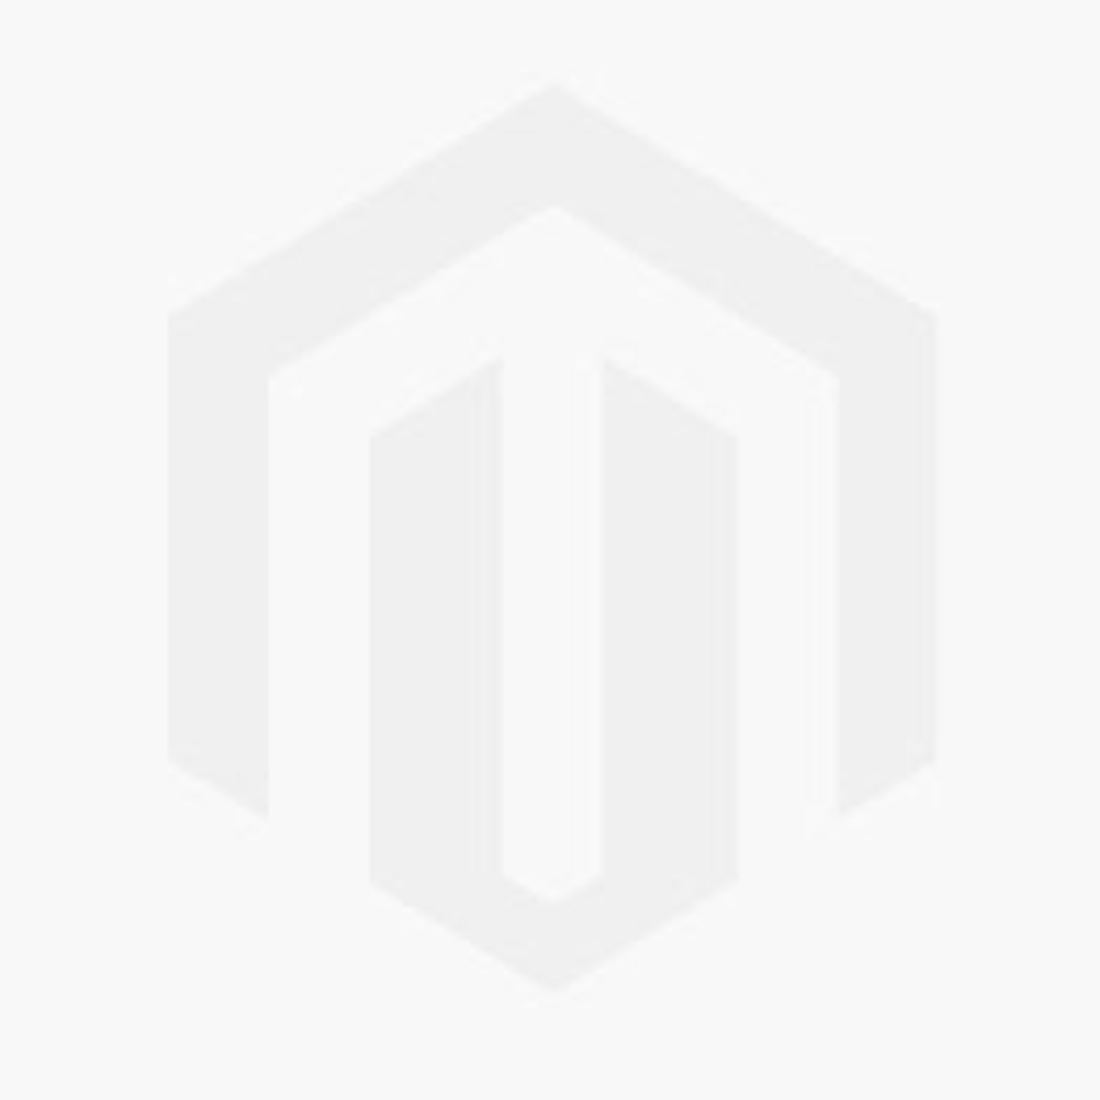 Lucian Freud: The Self-portraits Hardback Catalogue